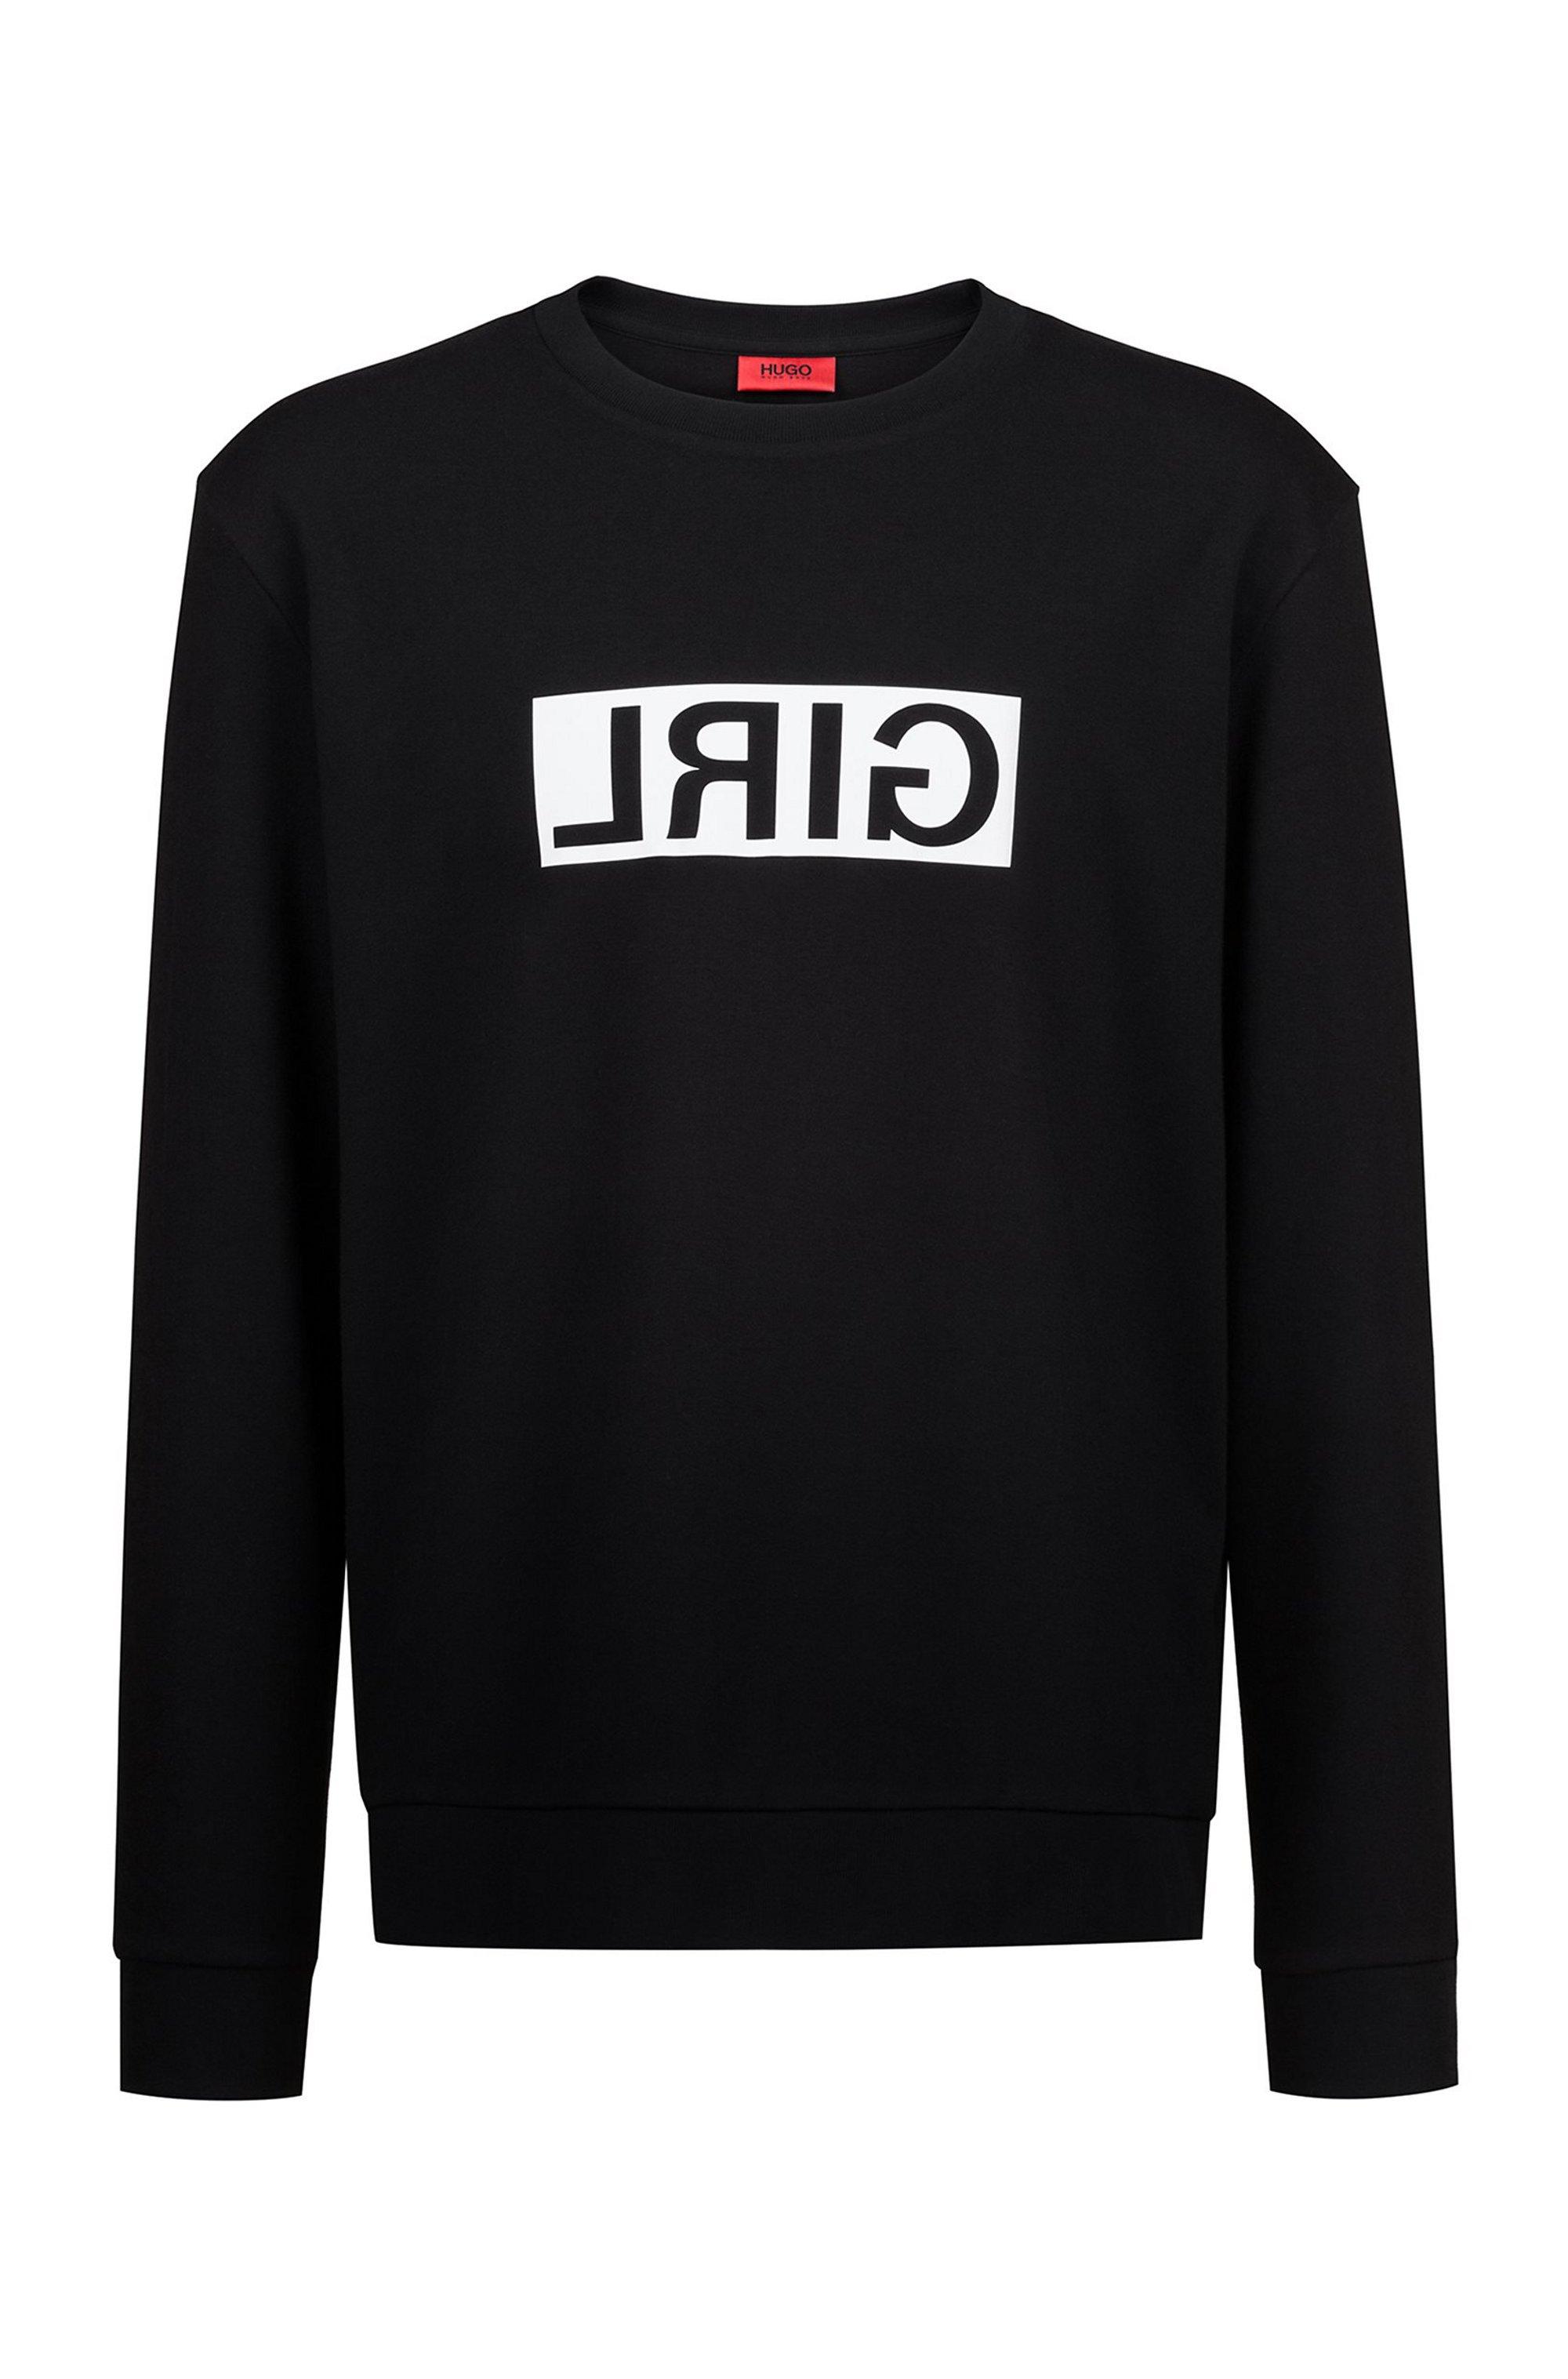 Unisex cotton sweatshirt with reversed personalisation, Black